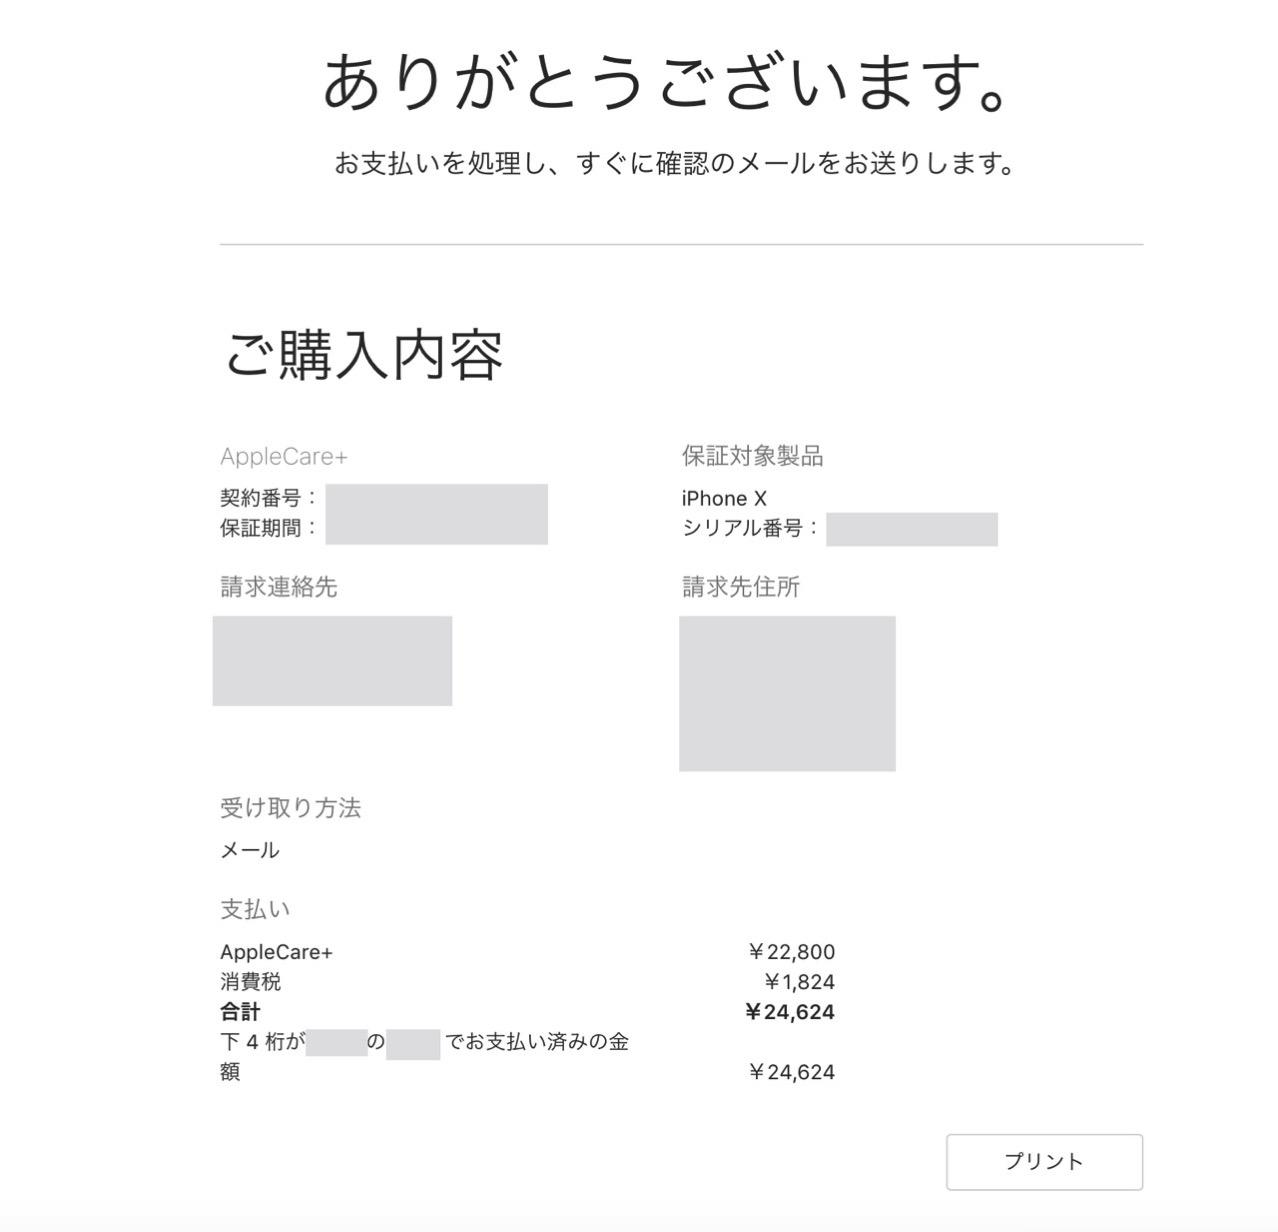 「AppleCare+」購入内容の確認